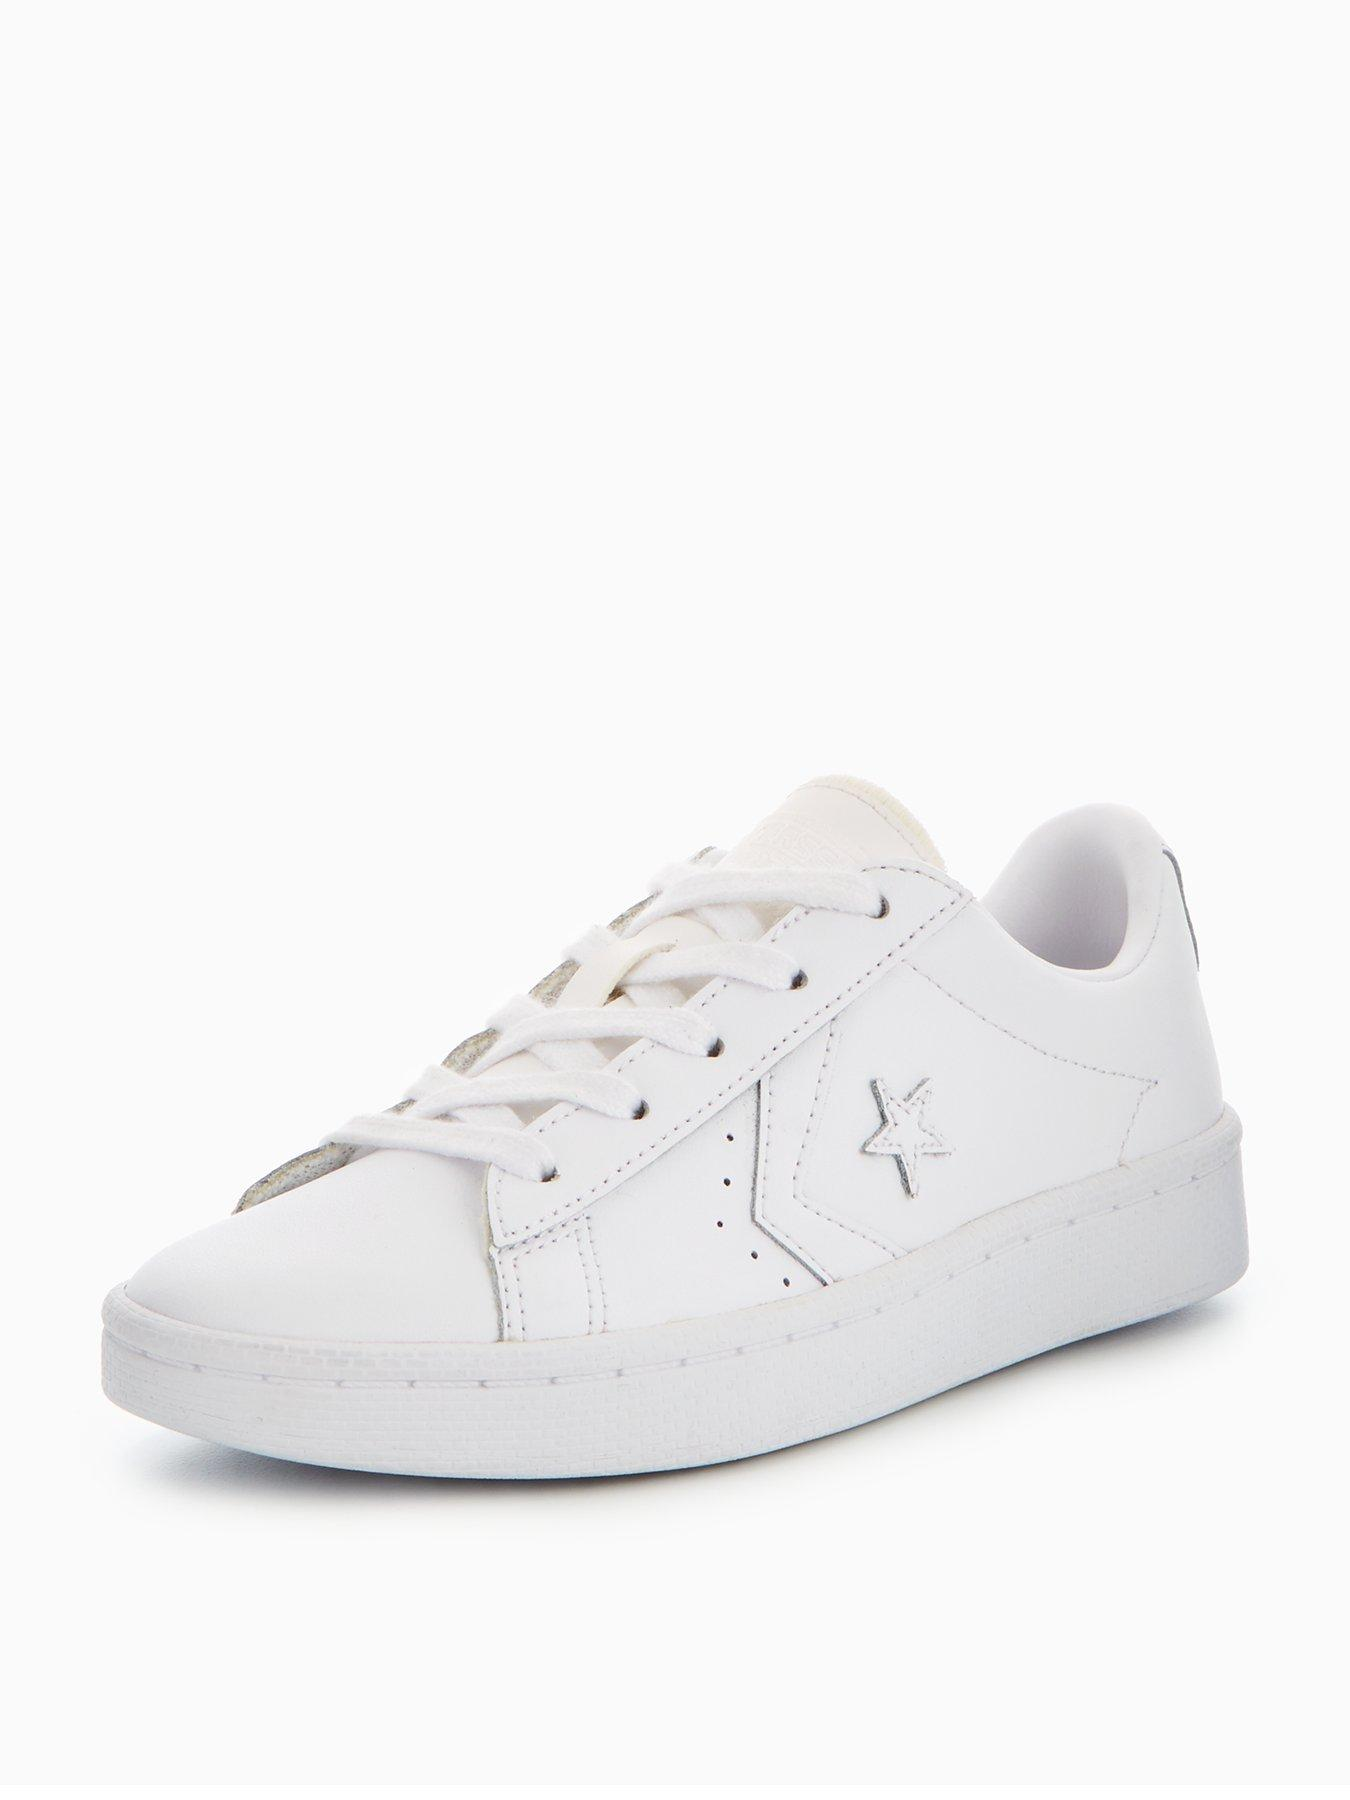 Converse   Junior footwear (sizes 3-6